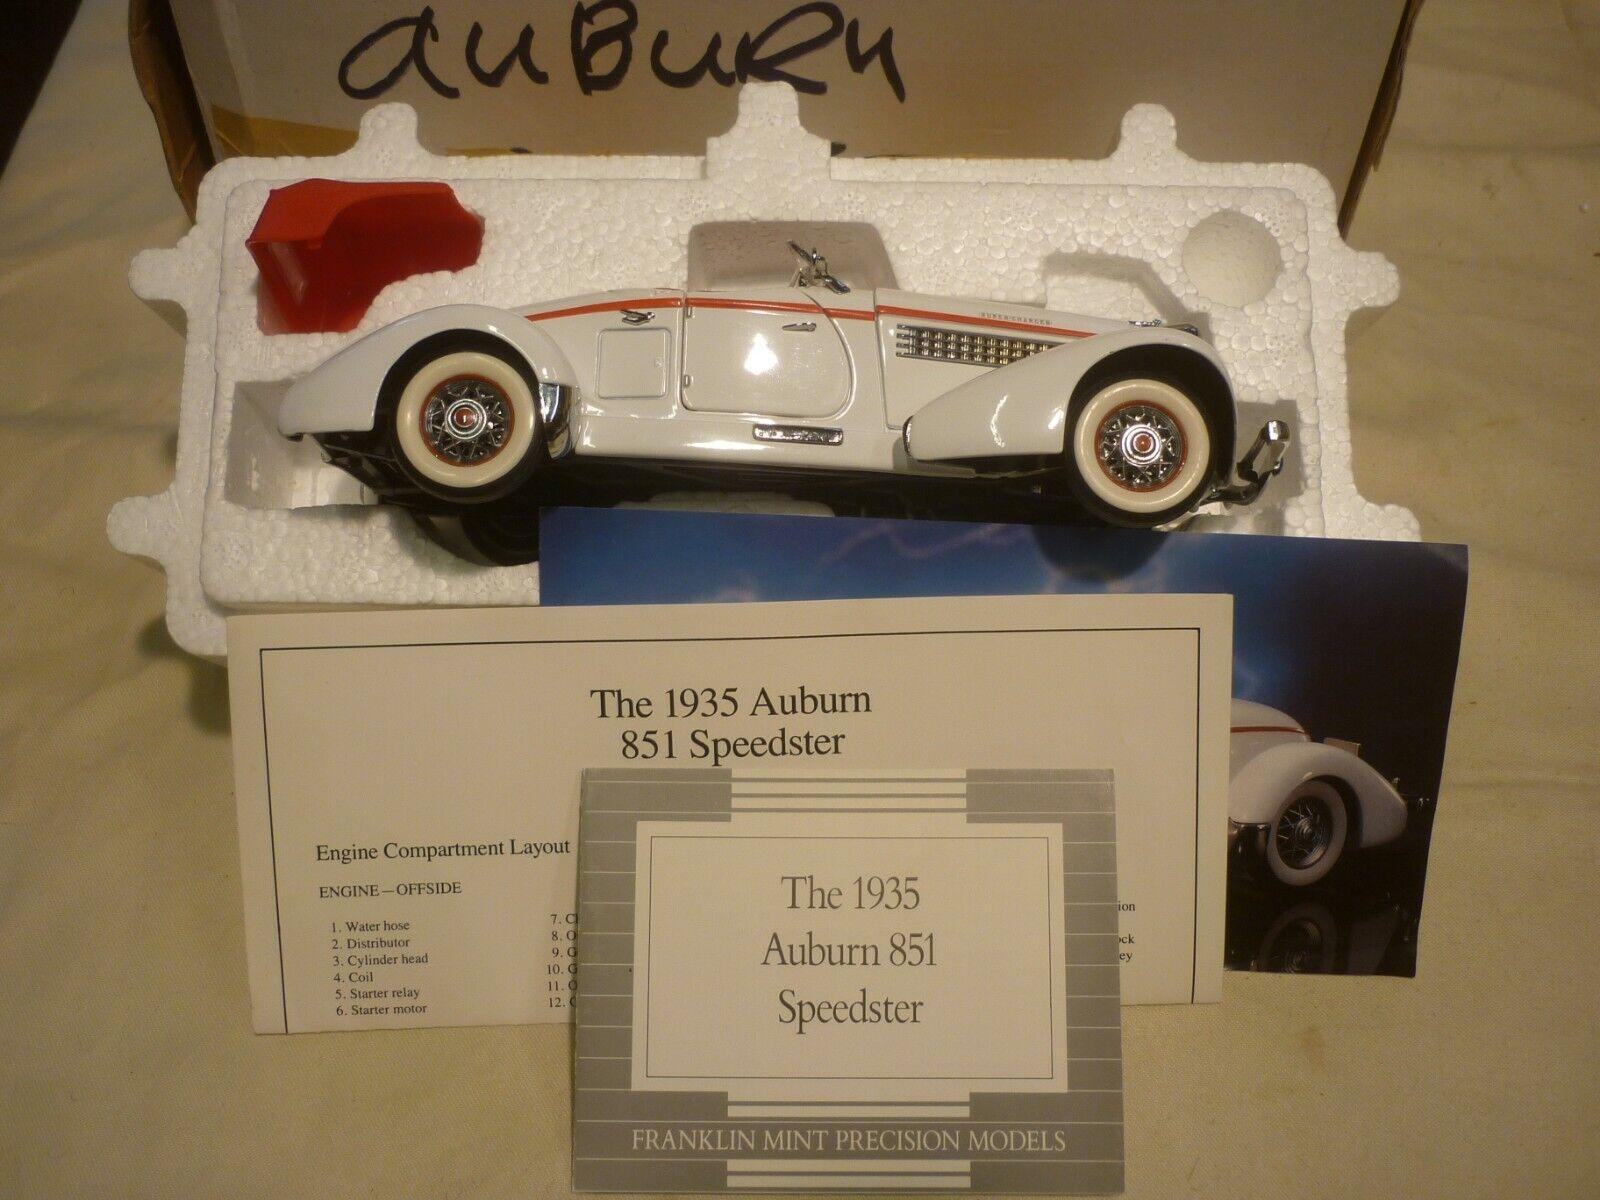 A Franklin mint scale model of a 1935 Auburn 851 Roadster,,  boxed